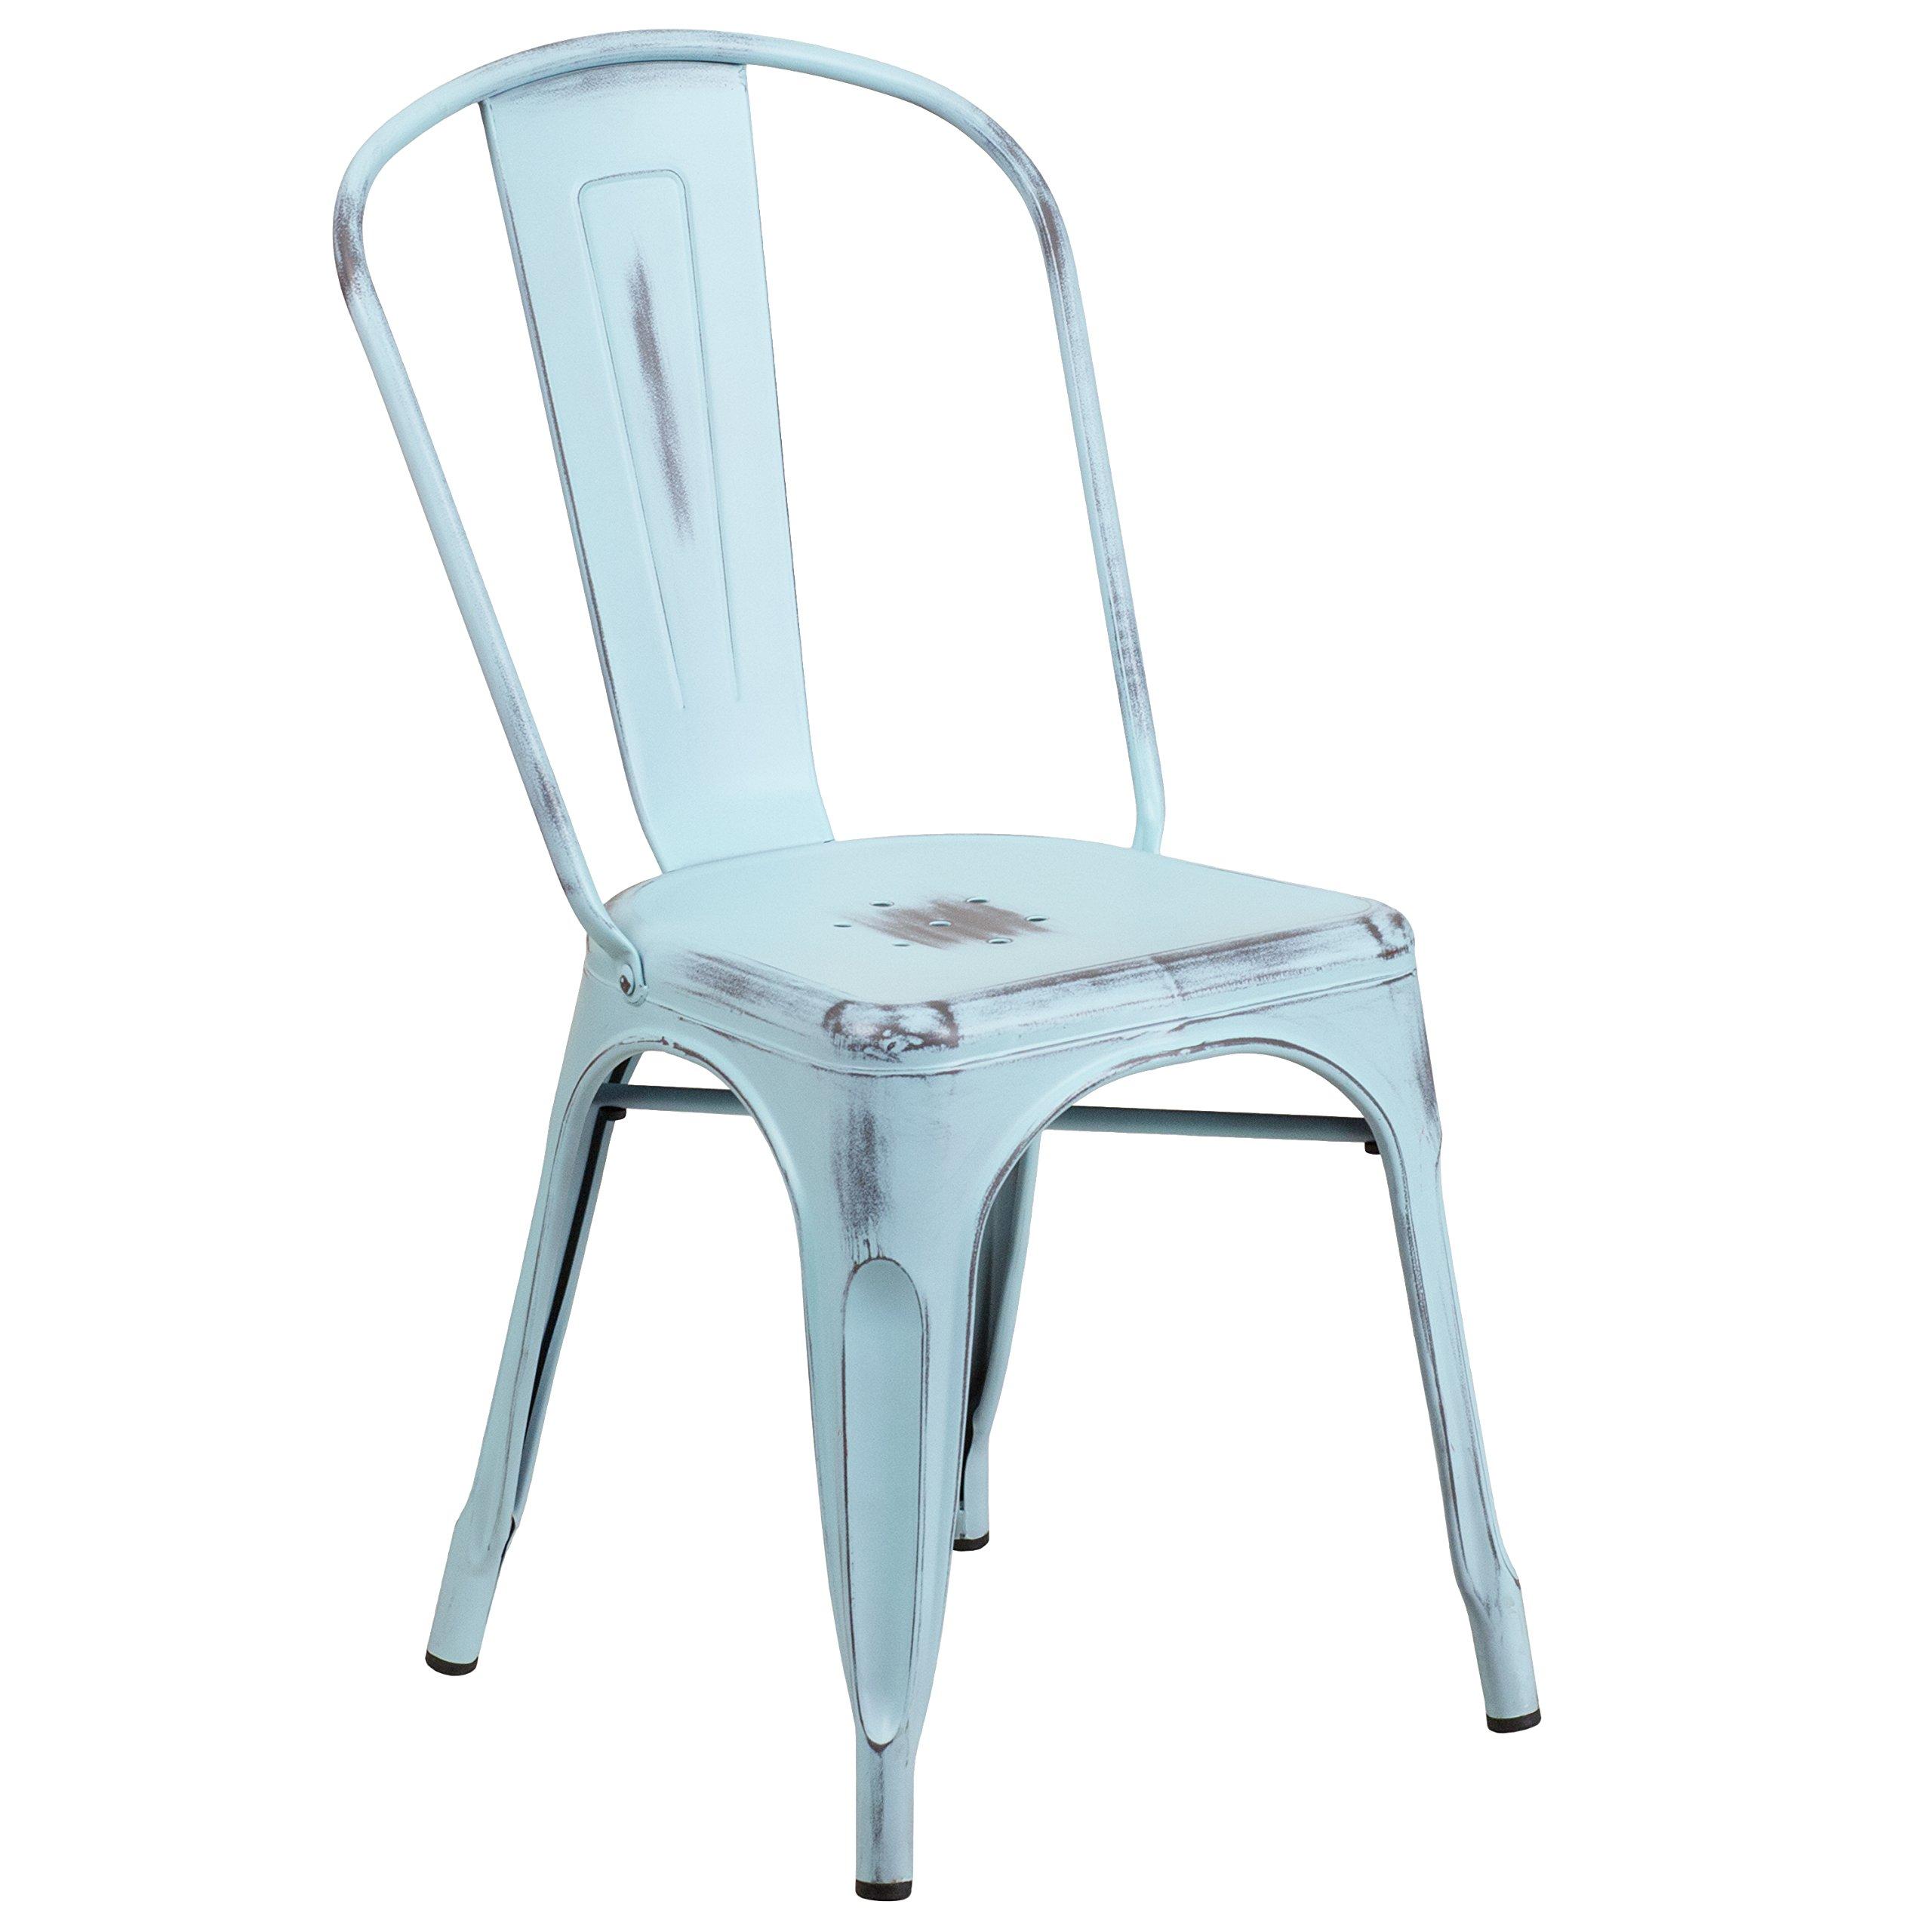 Flash Furniture Distressed Green-Blue Metal Indoor-Outdoor Stackable Chair